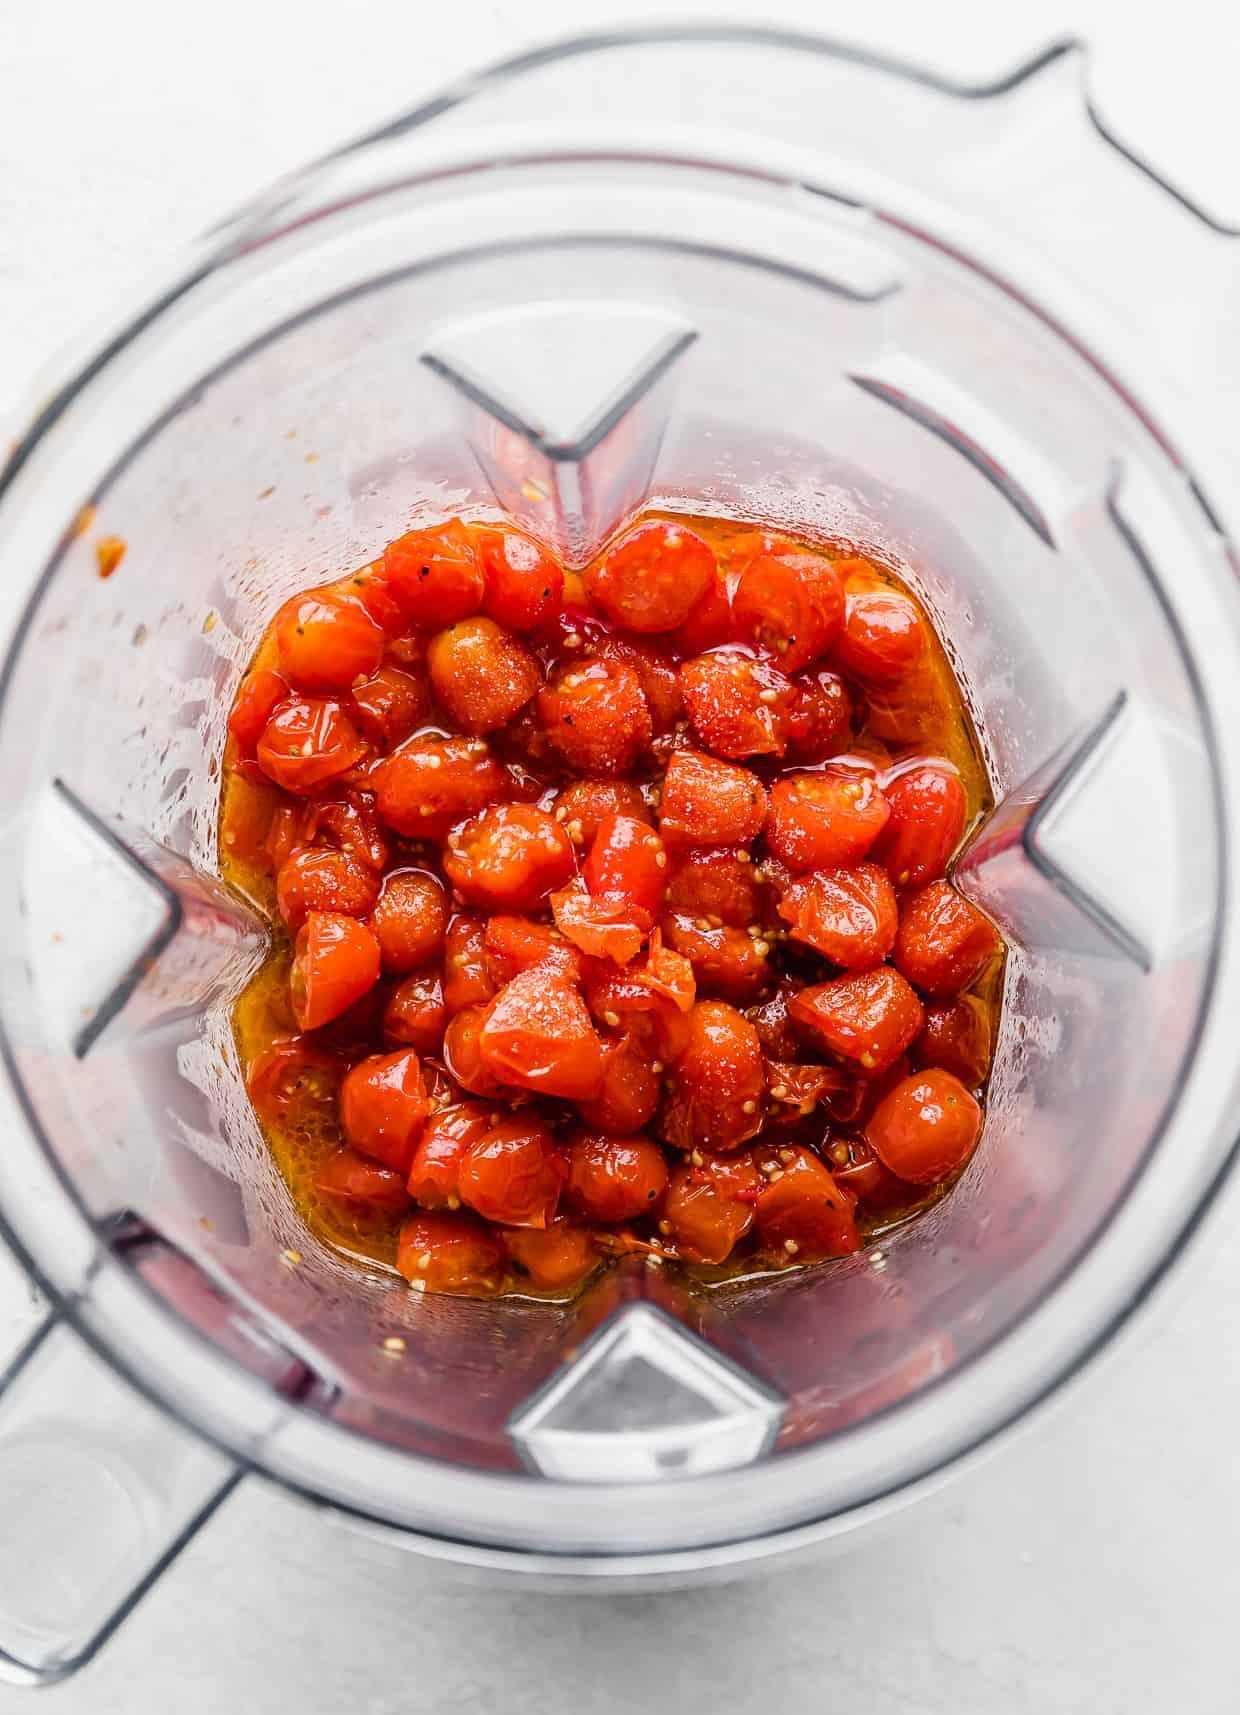 Roasted tomatoes in blender.